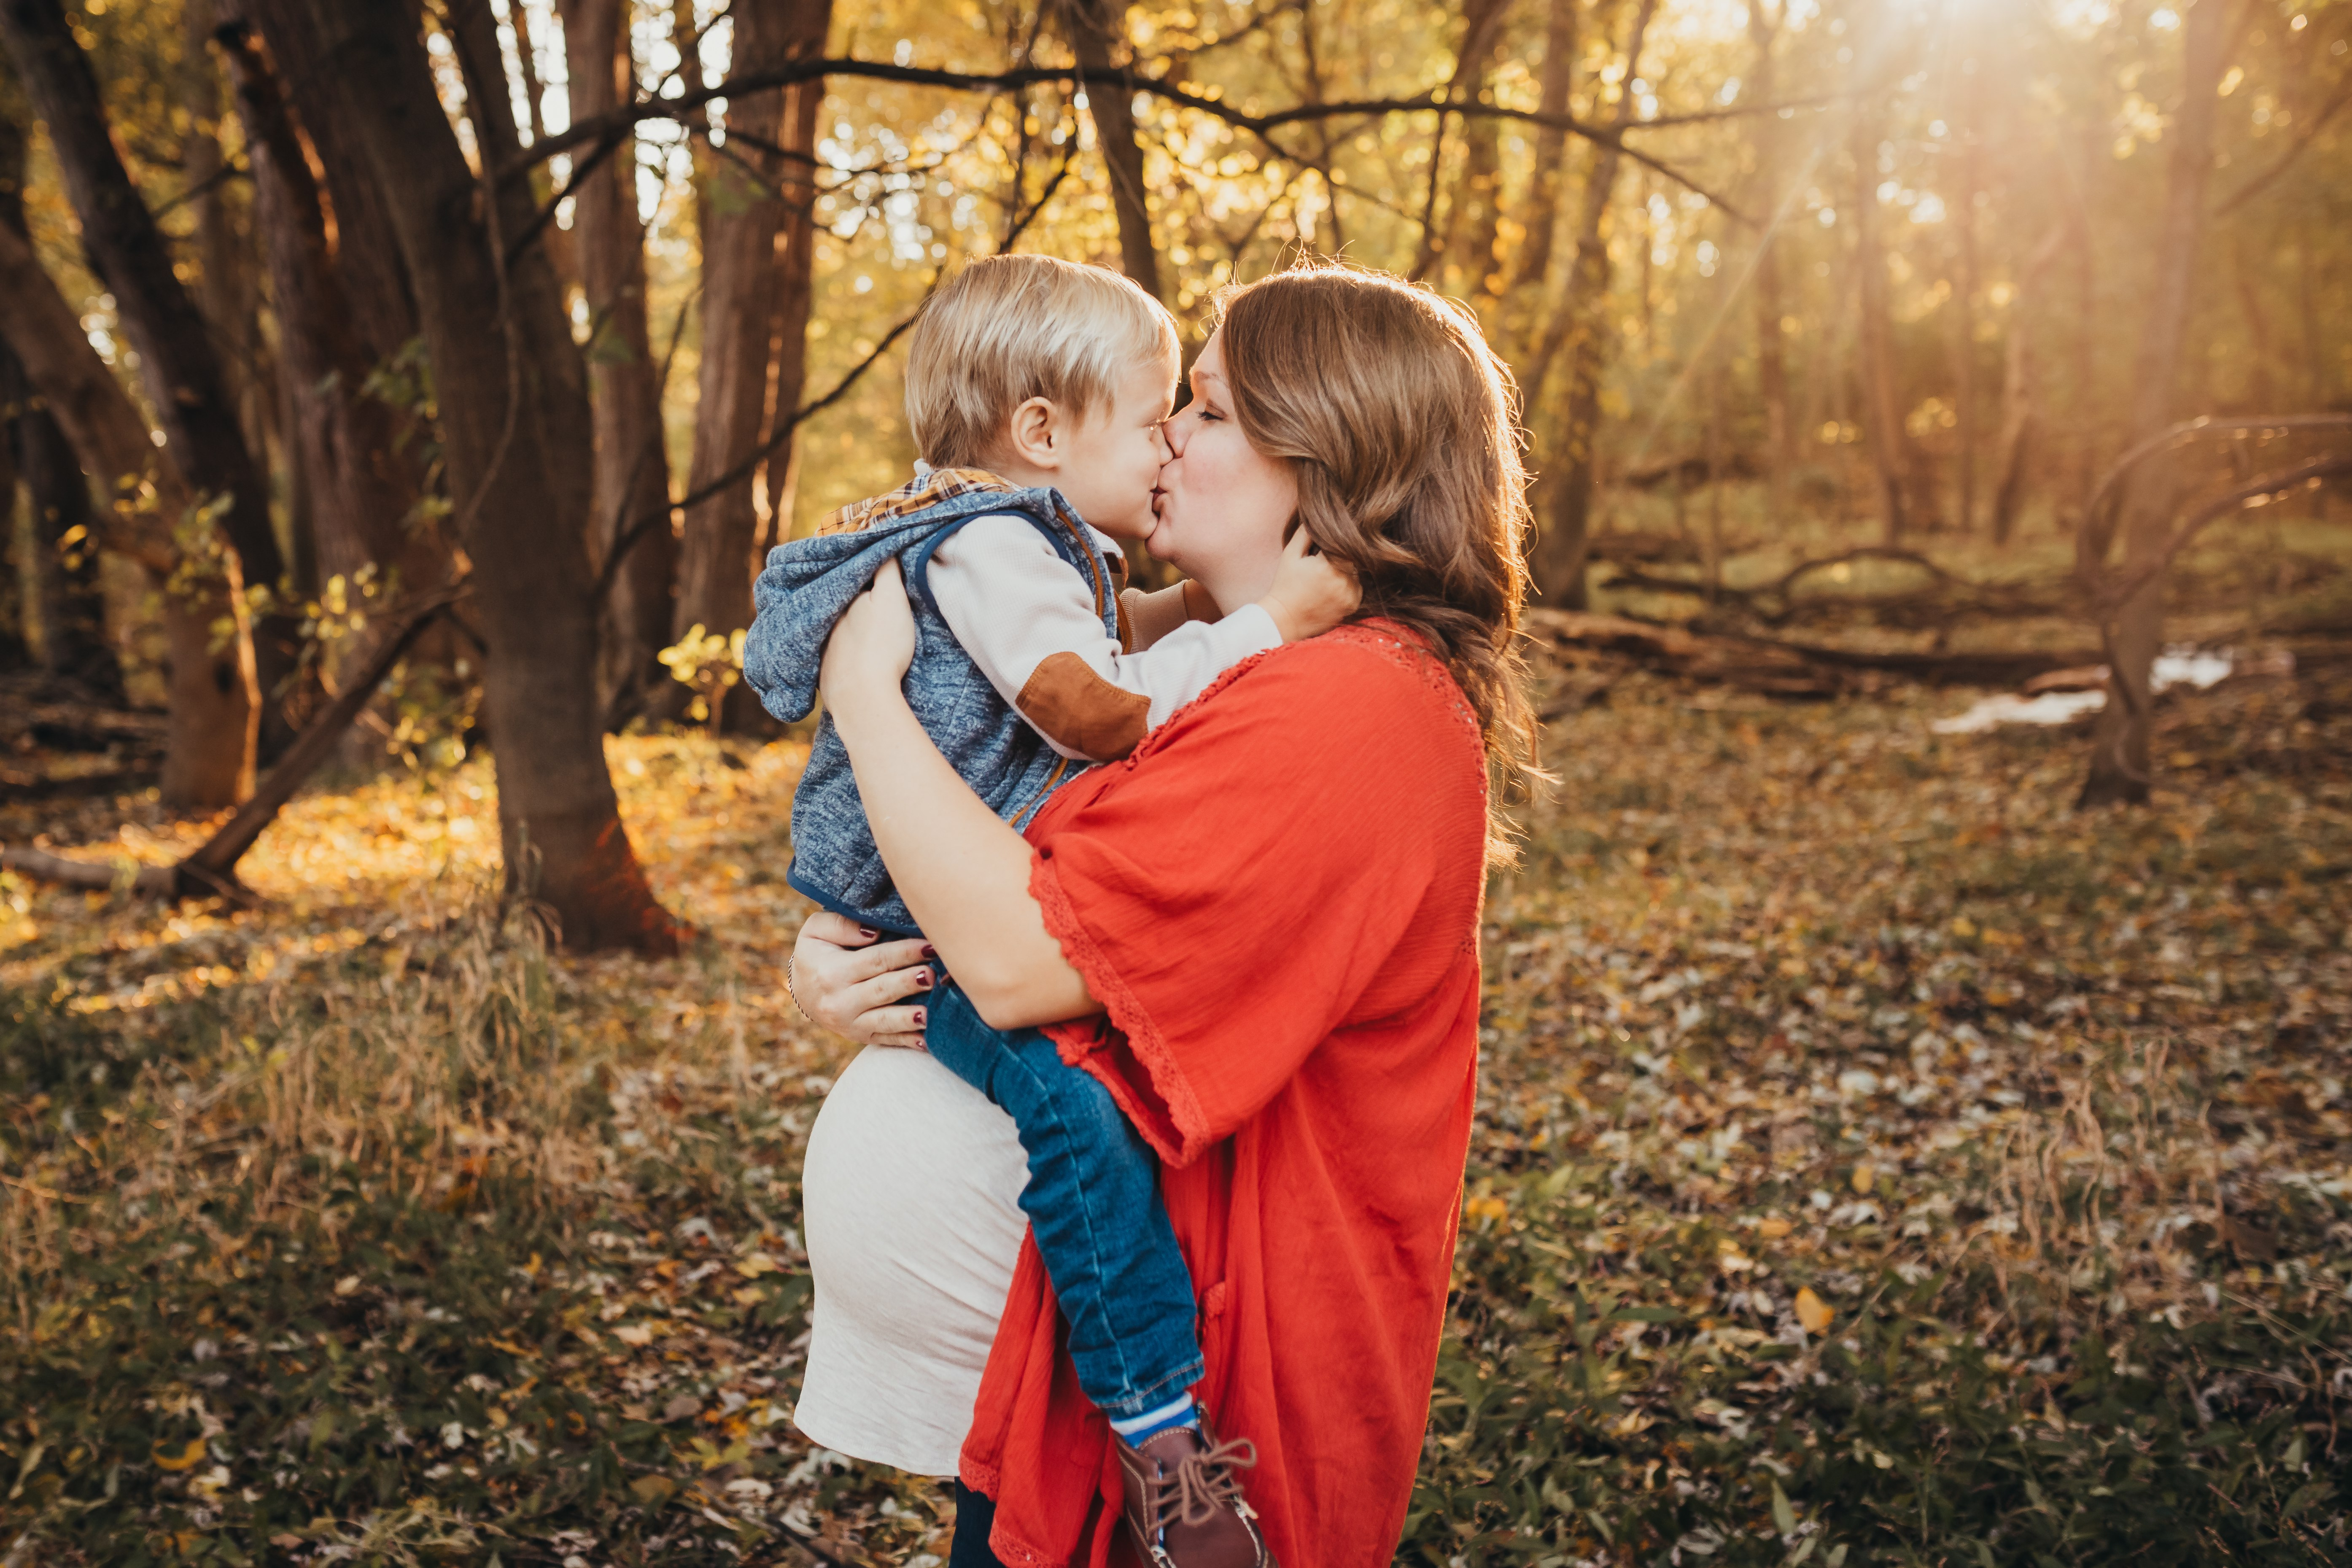 Raise-a-little-love-photography-lauren-lewis-indianapolis-maternity